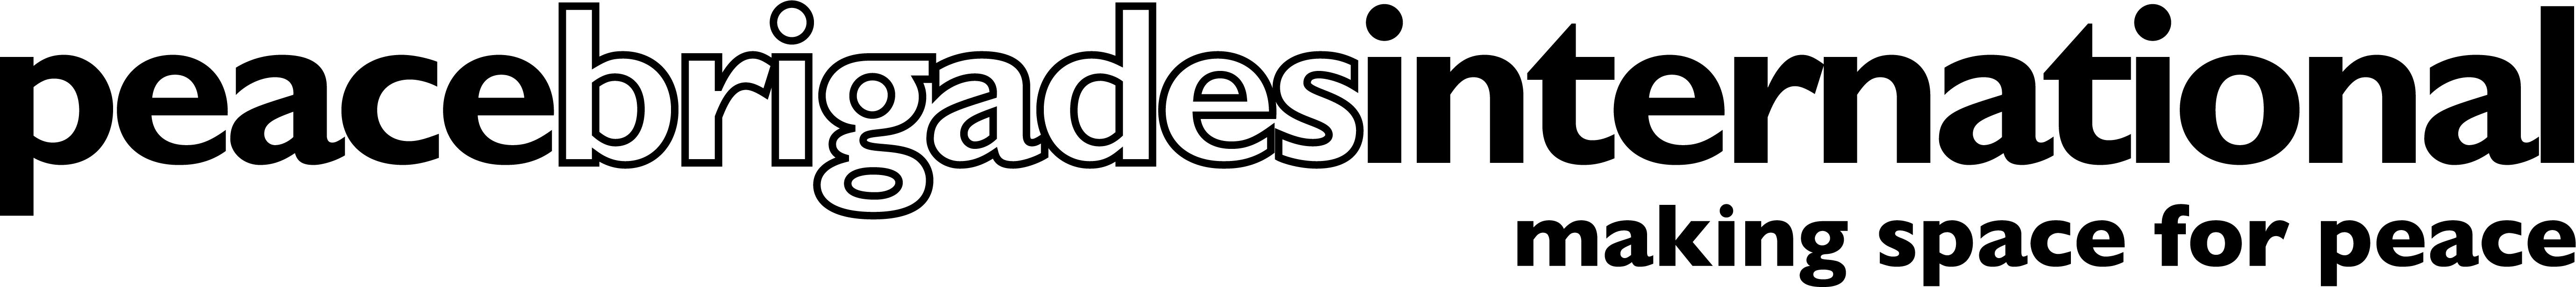 logo_pbi_2